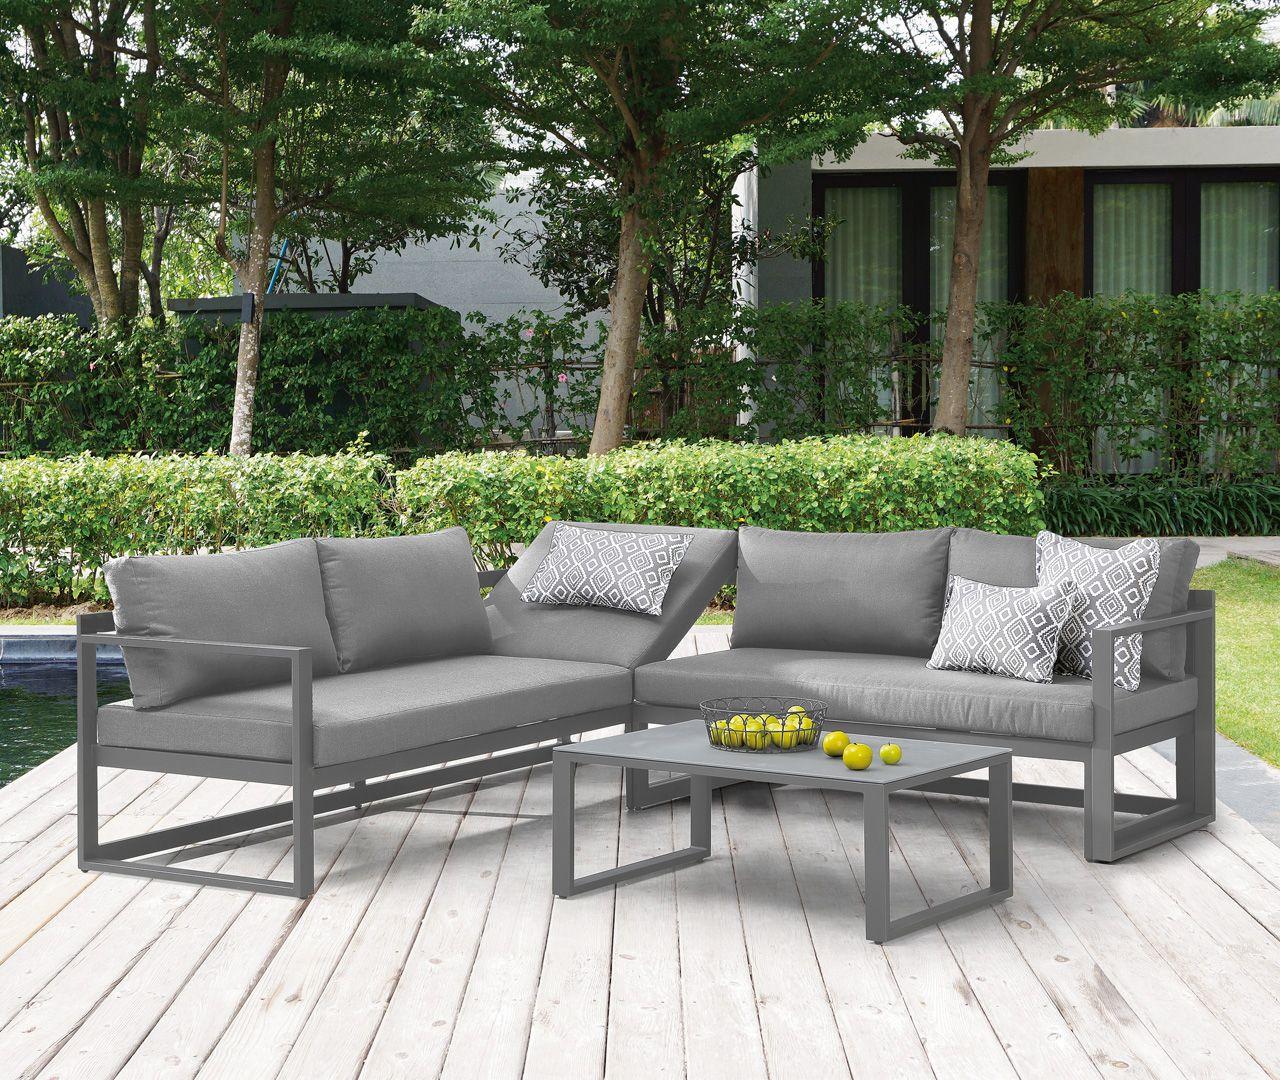 Gartenlounge Nizza Mobel Egger Furniture Outdoor Sectional Sofa Outdoor Furniture